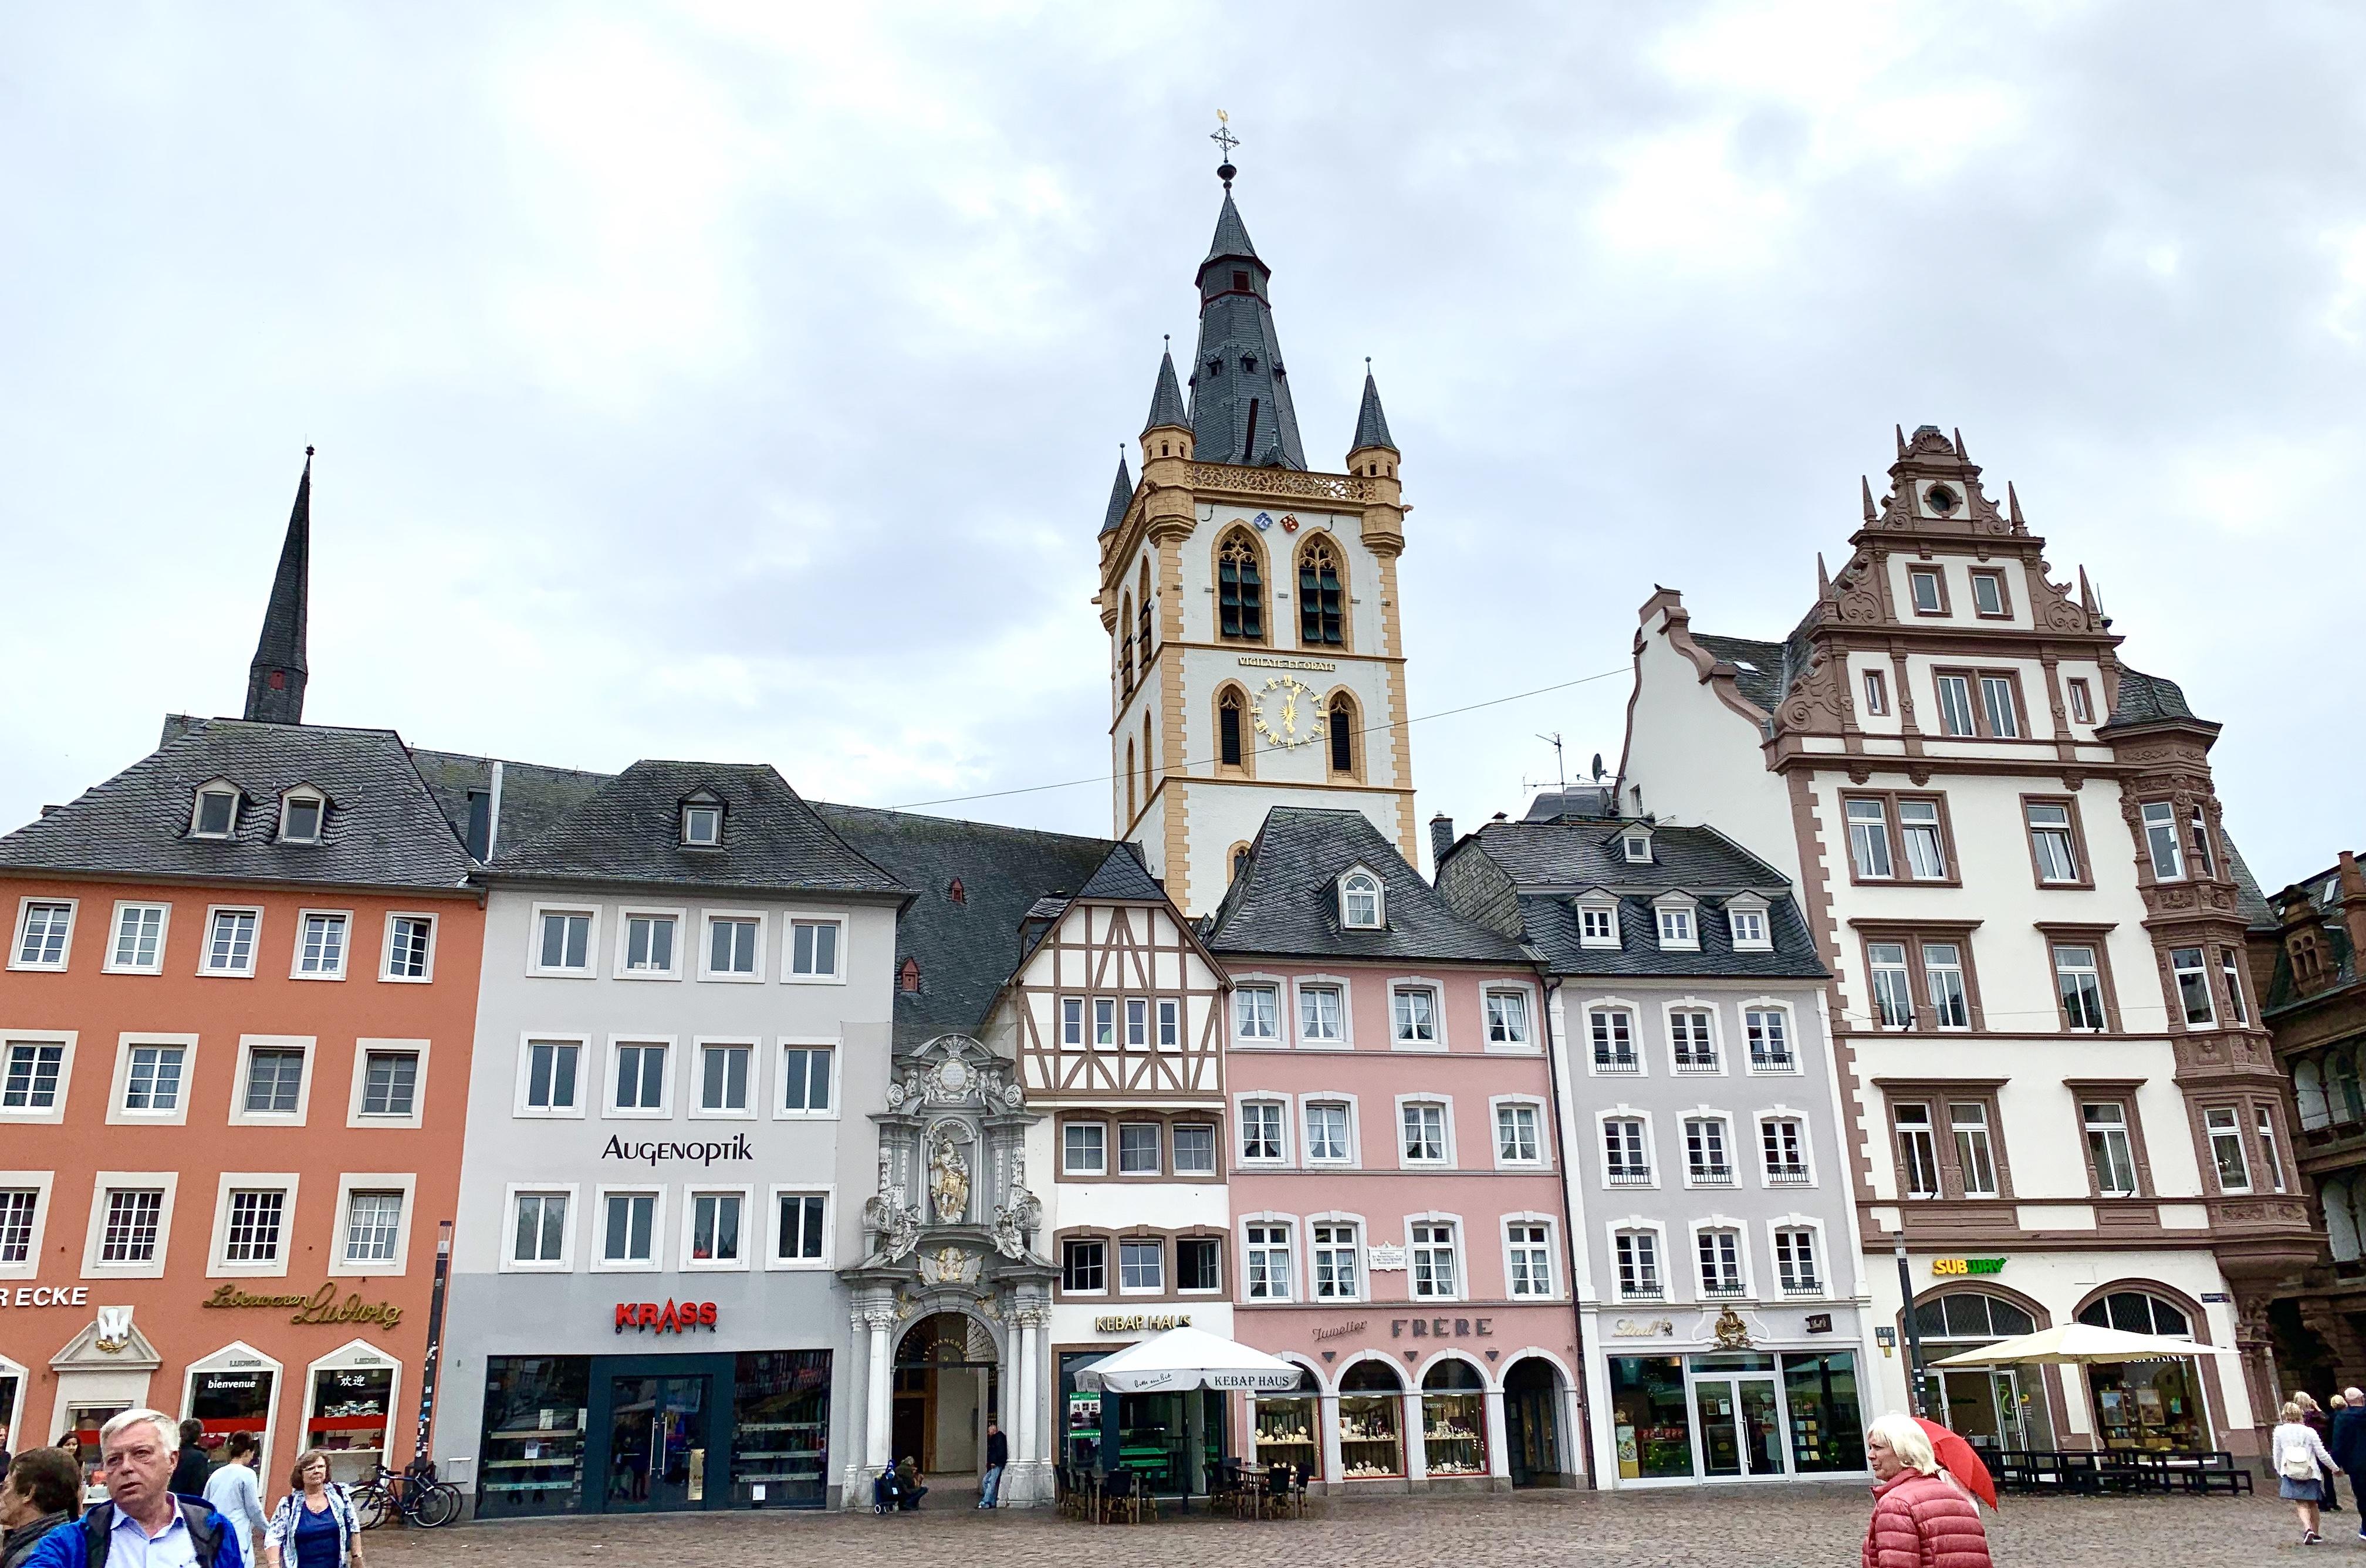 img 0765 - Day Trip to Trier, Germany